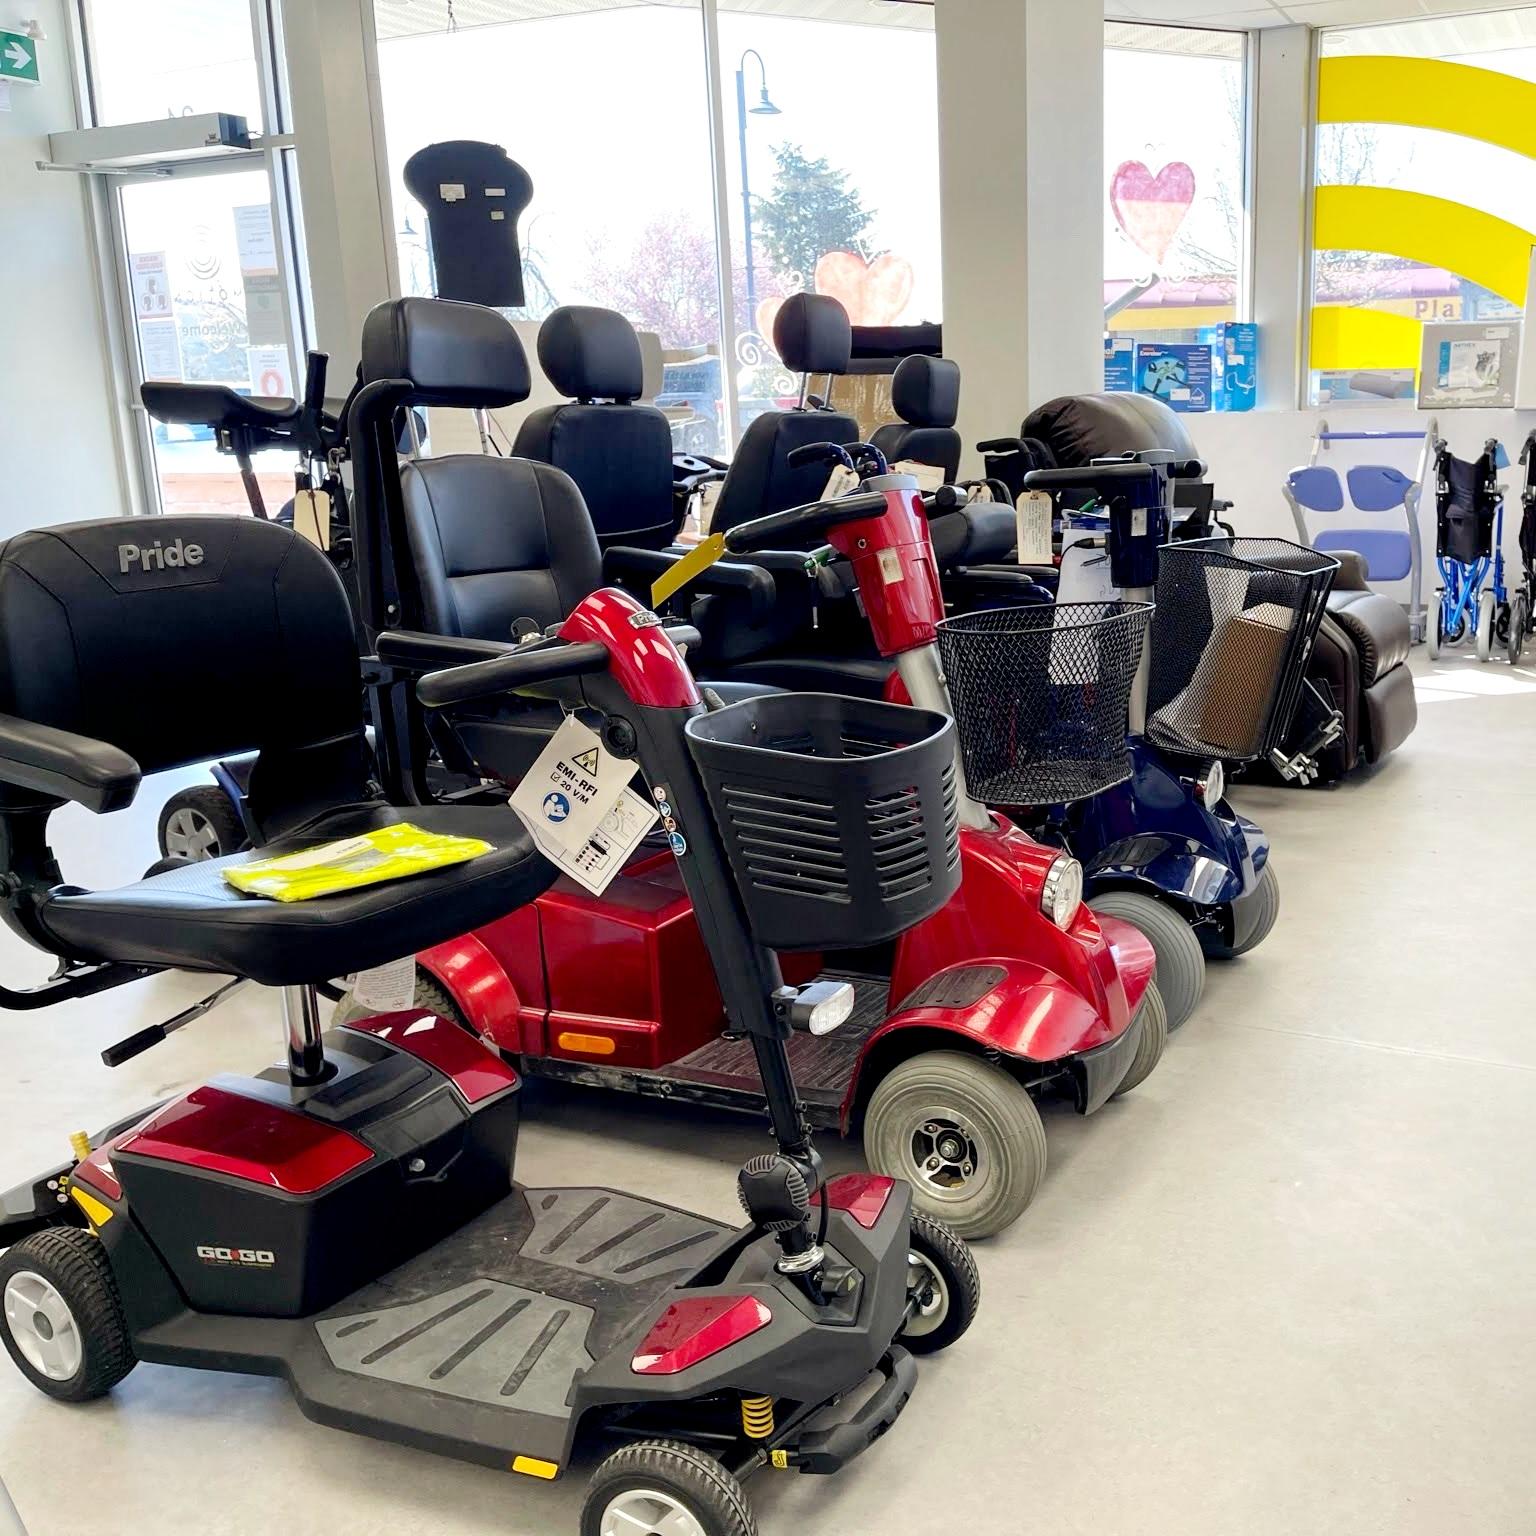 Comox showroom - mobility scooter display